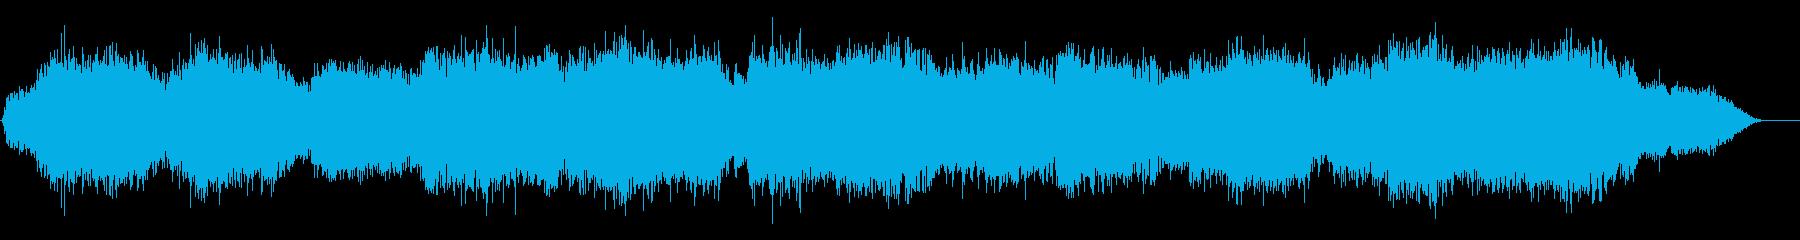 Suspicious Oba ❤ Mysterious chorus ❤ B's reproduced waveform